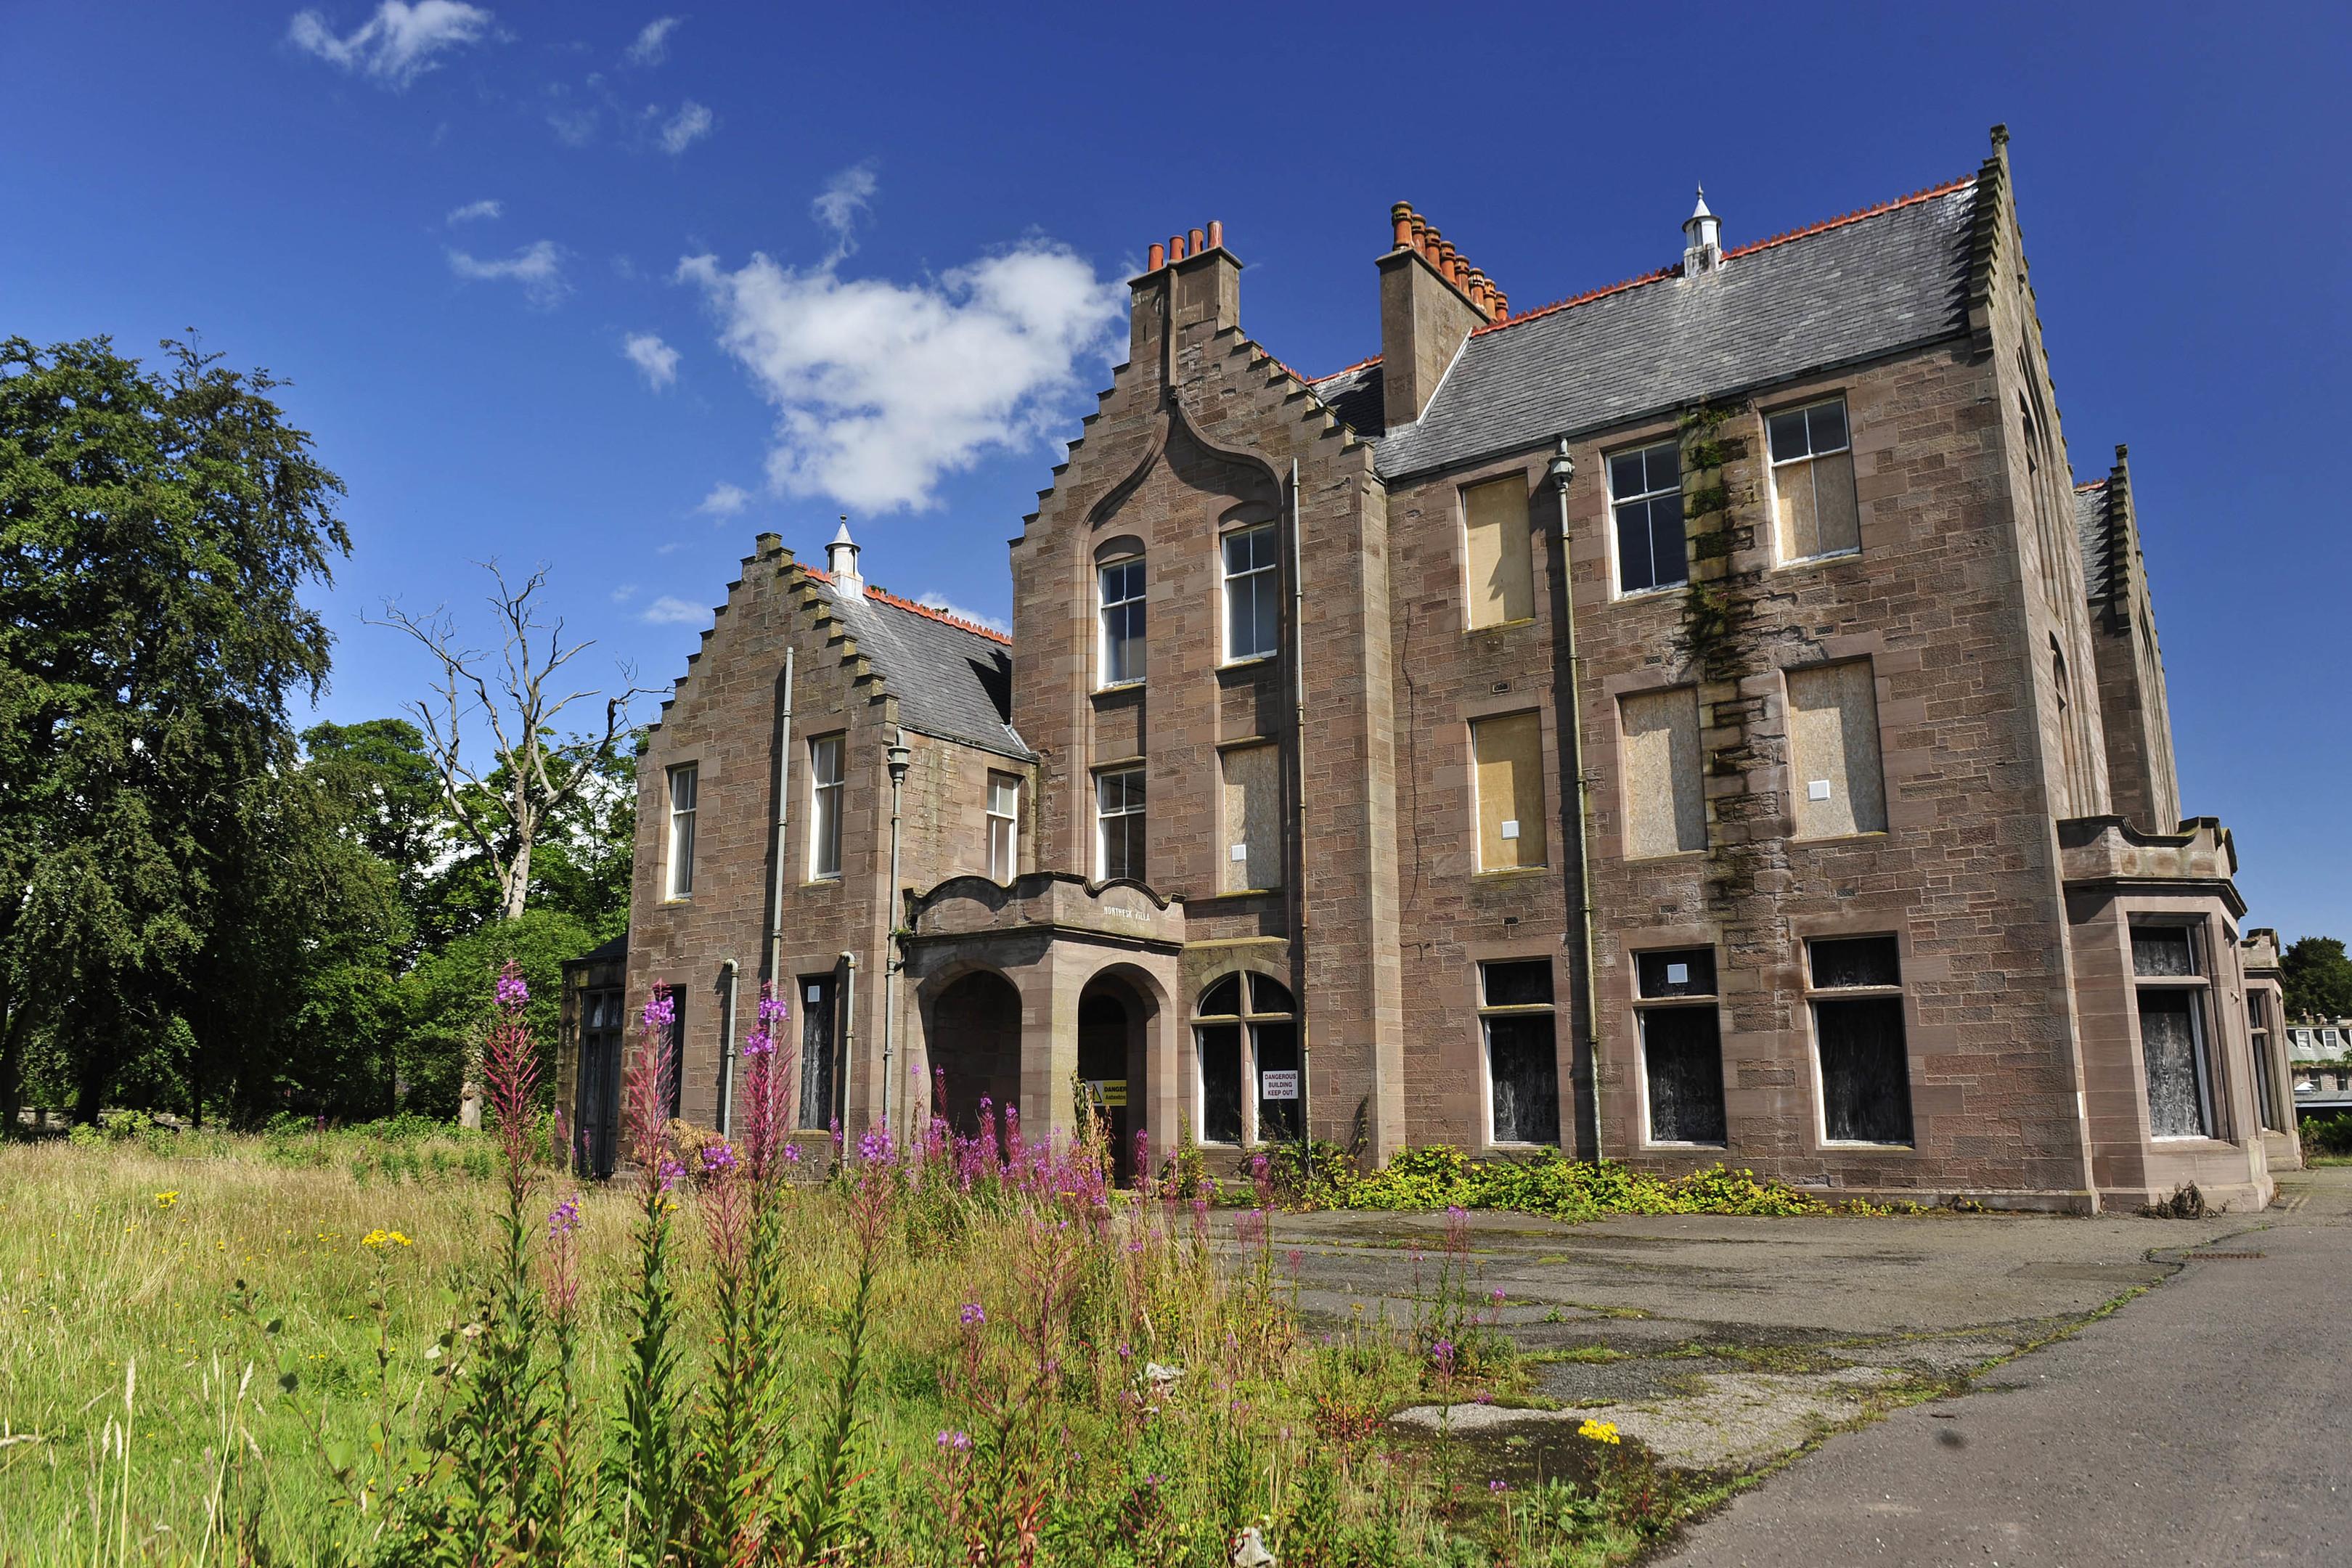 The former Sunnyside hospital